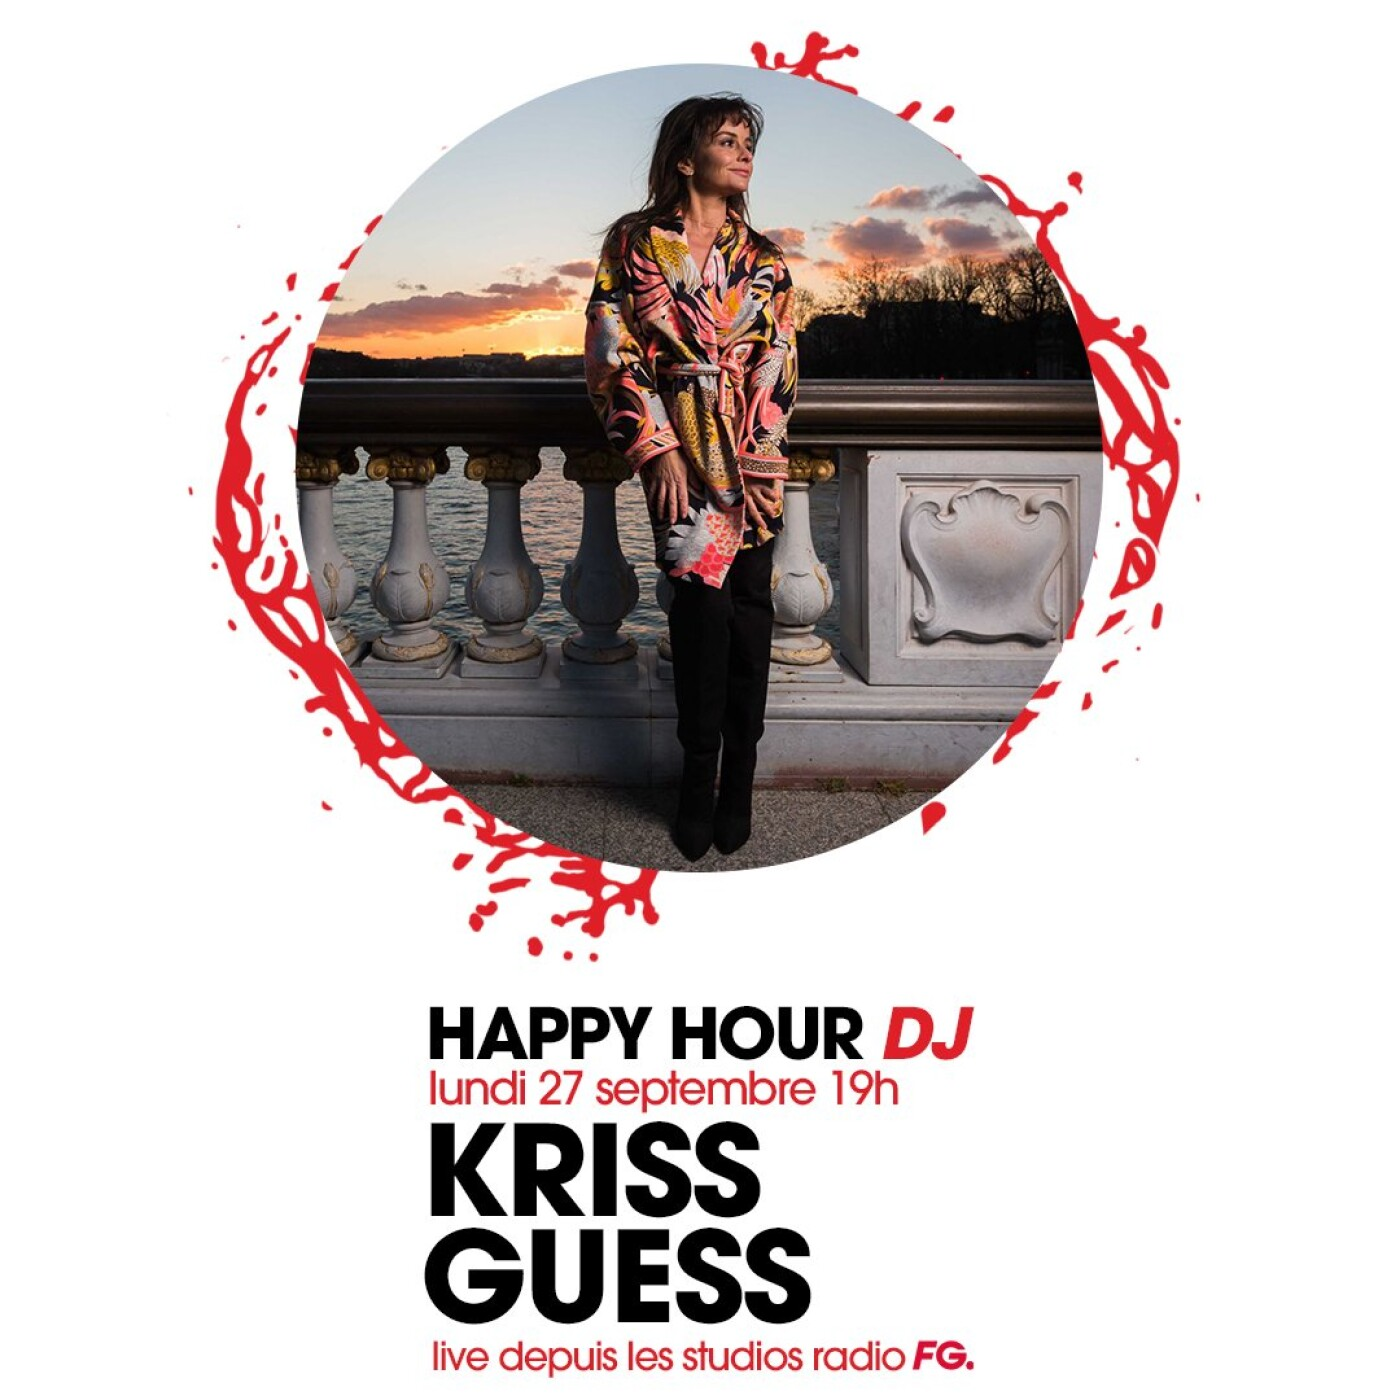 HAPPY HOUR DJ : KRISS GUESS